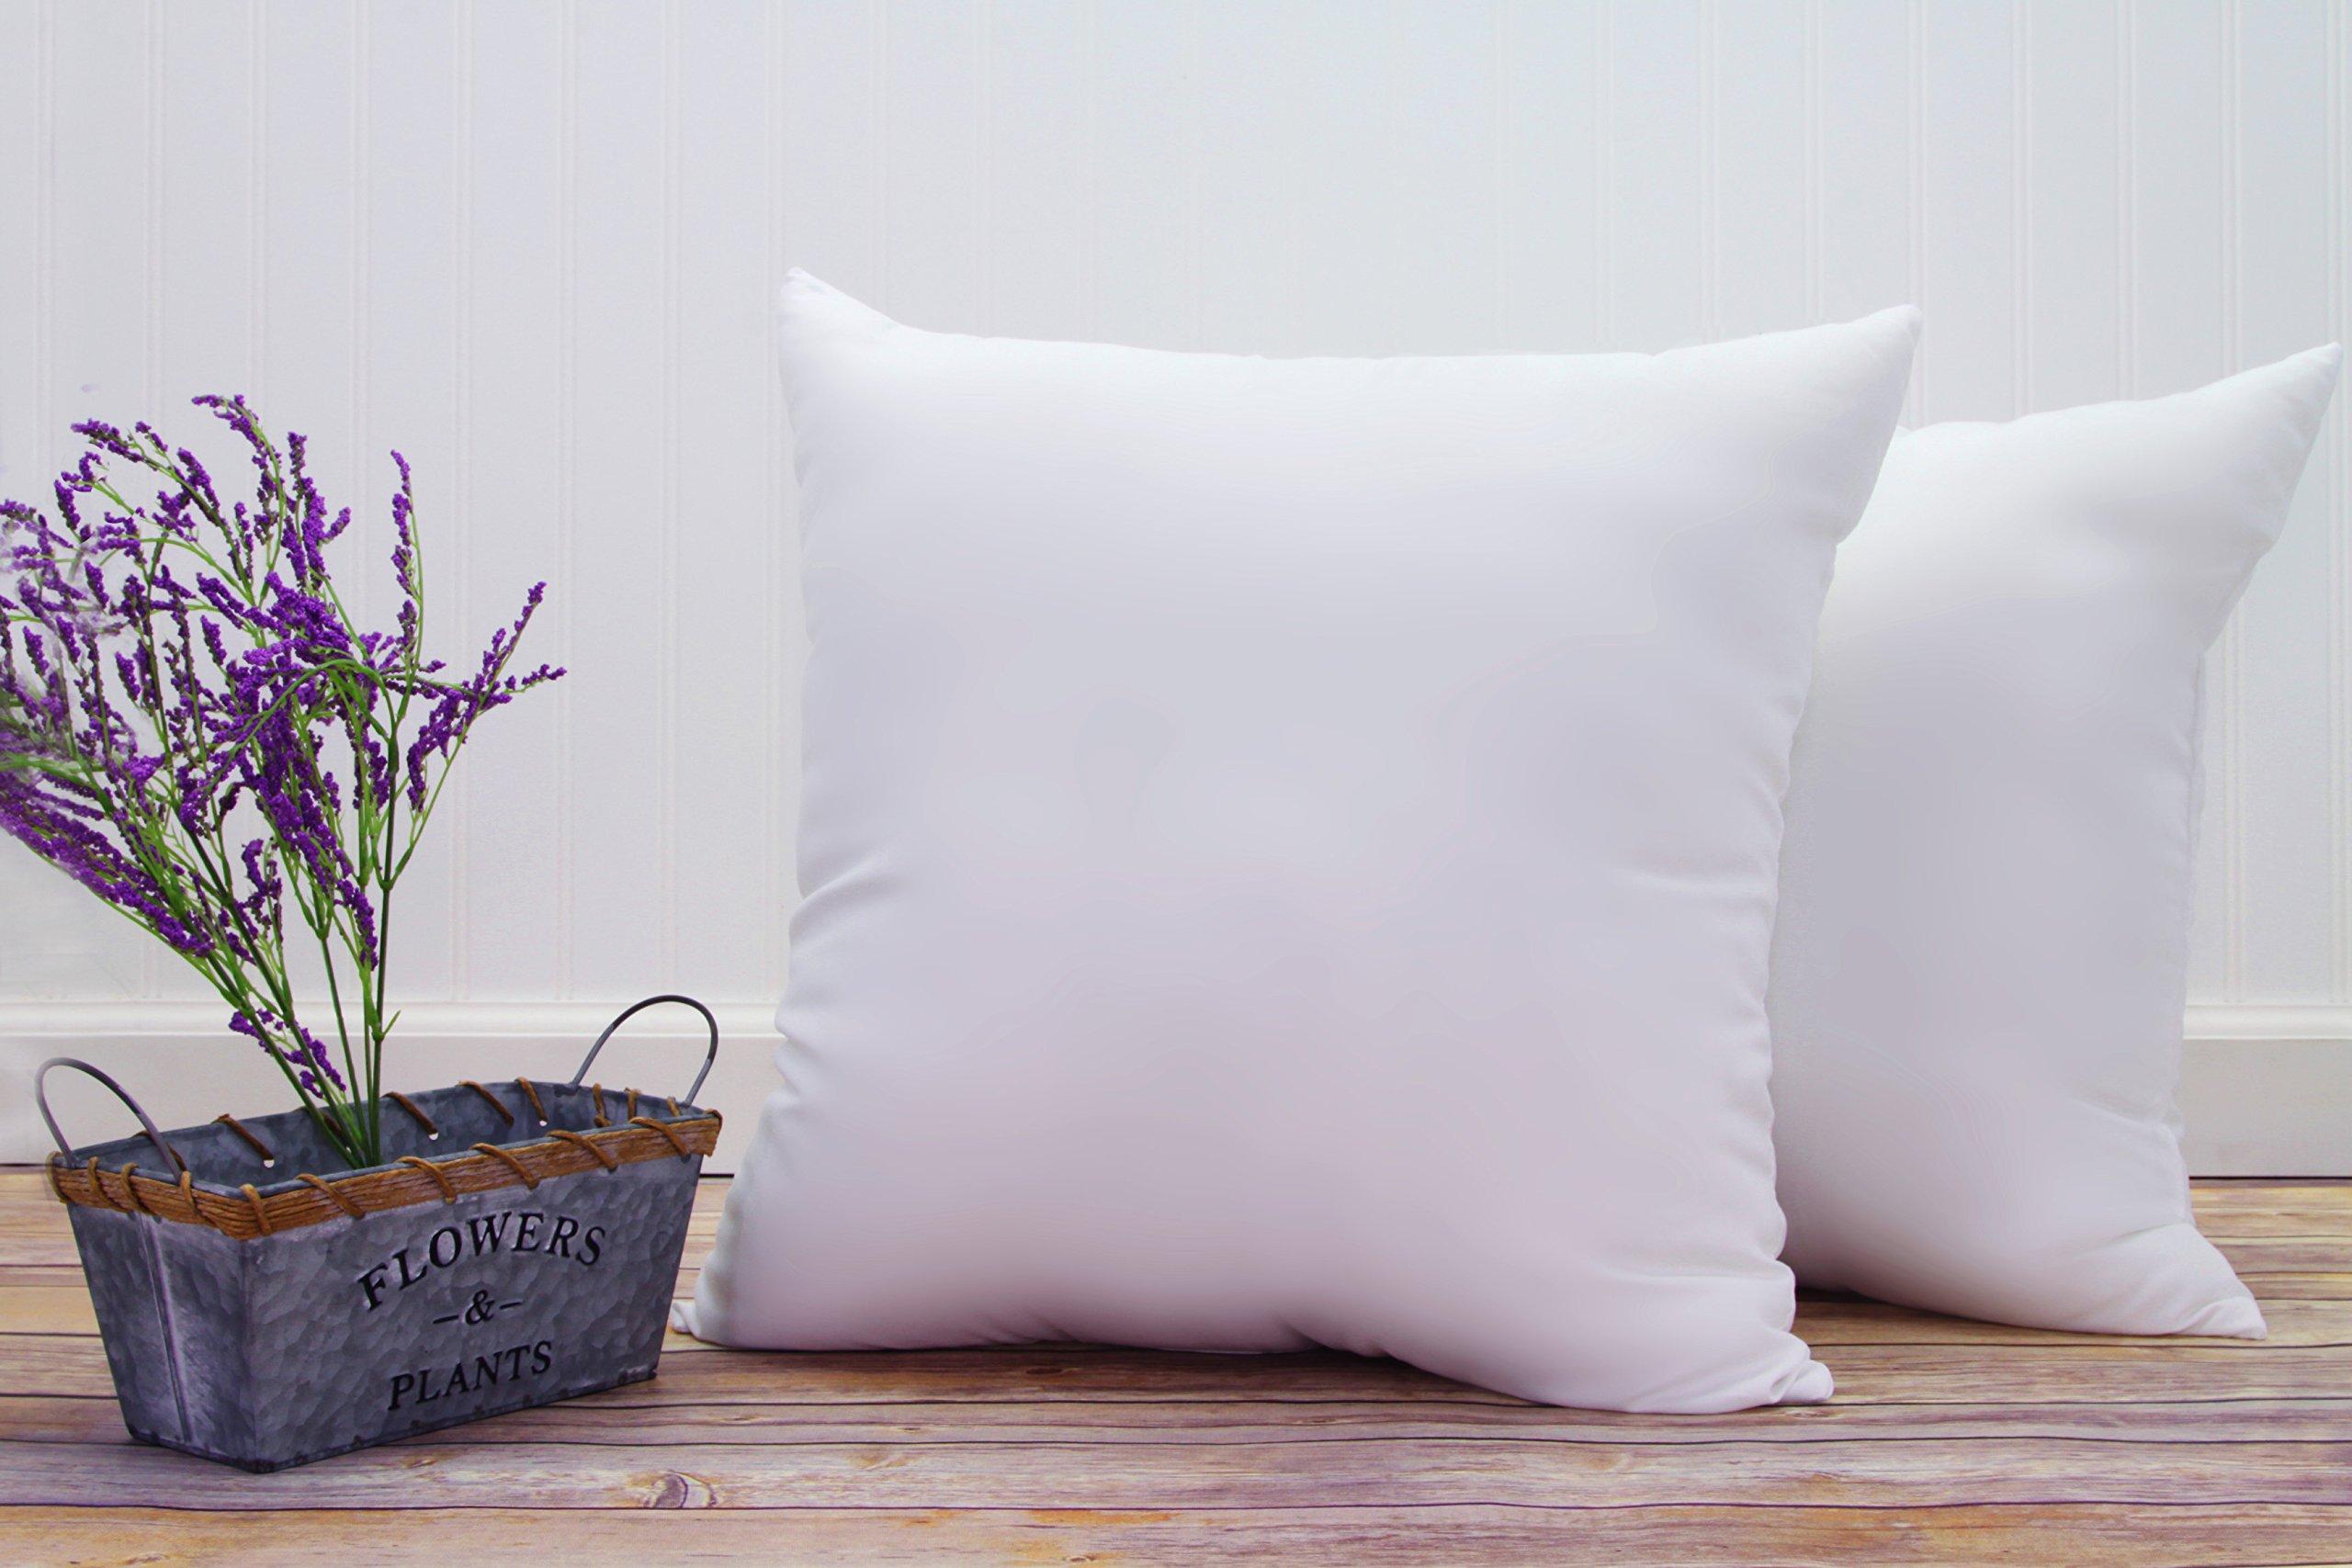 Pal Fabric (Set of 2) Premium Cotton Feel Microfiber Square Sham Pillow Insert 18x18 Made in USA